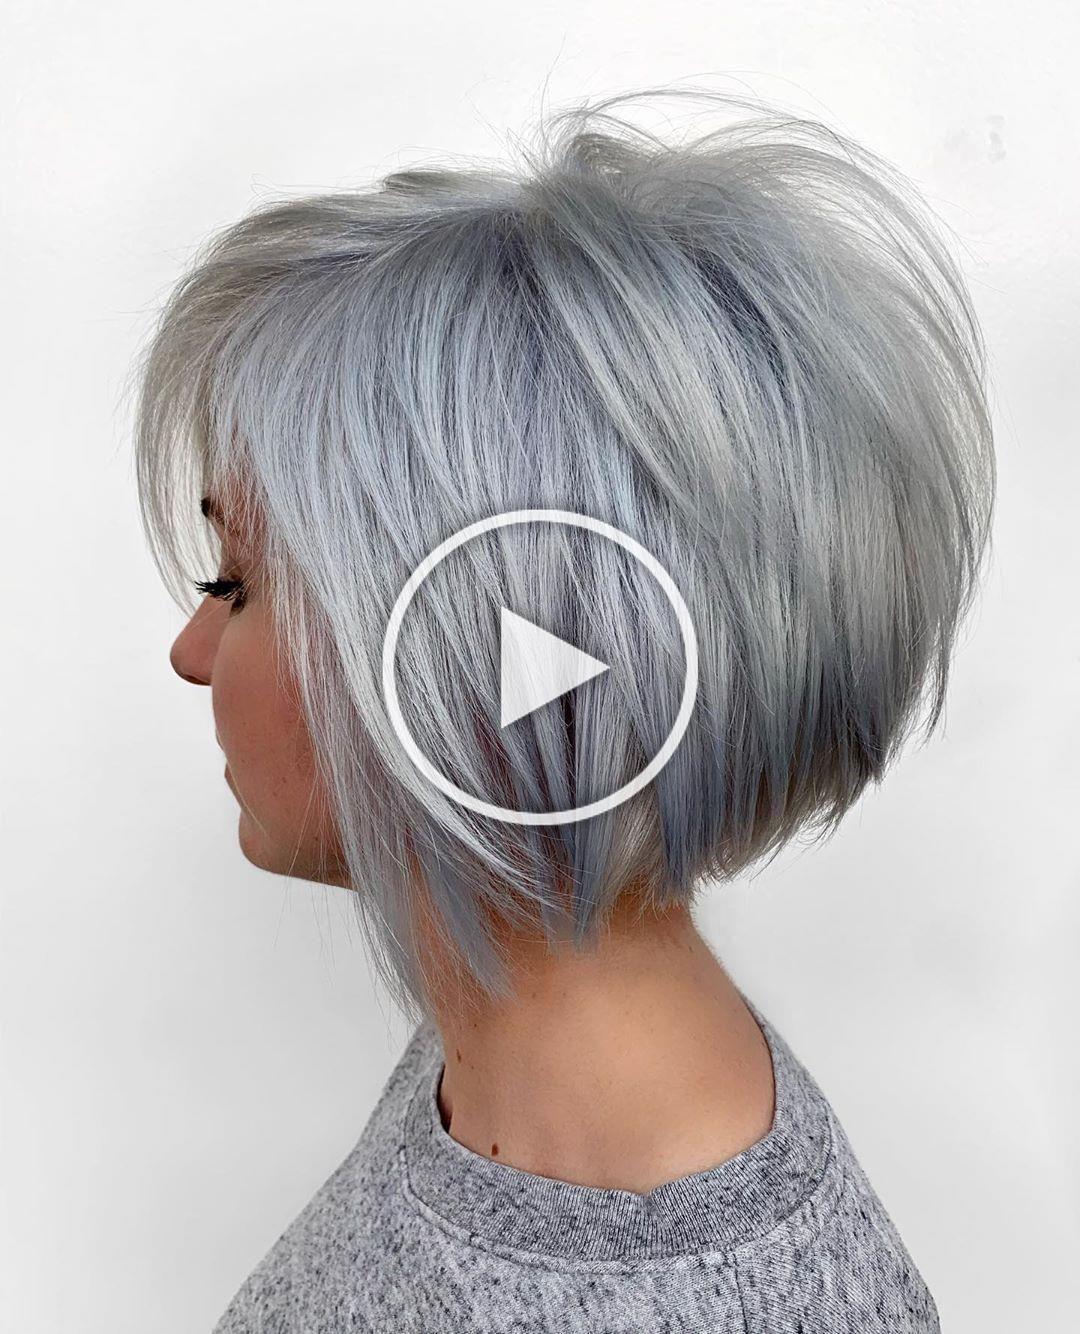 10 Short Bob Hair Color Ideas Women Short Hair Styles Color 2020 2021 In 2020 Bob Hair Color Short Hairstyles For Women Bob Hairstyles